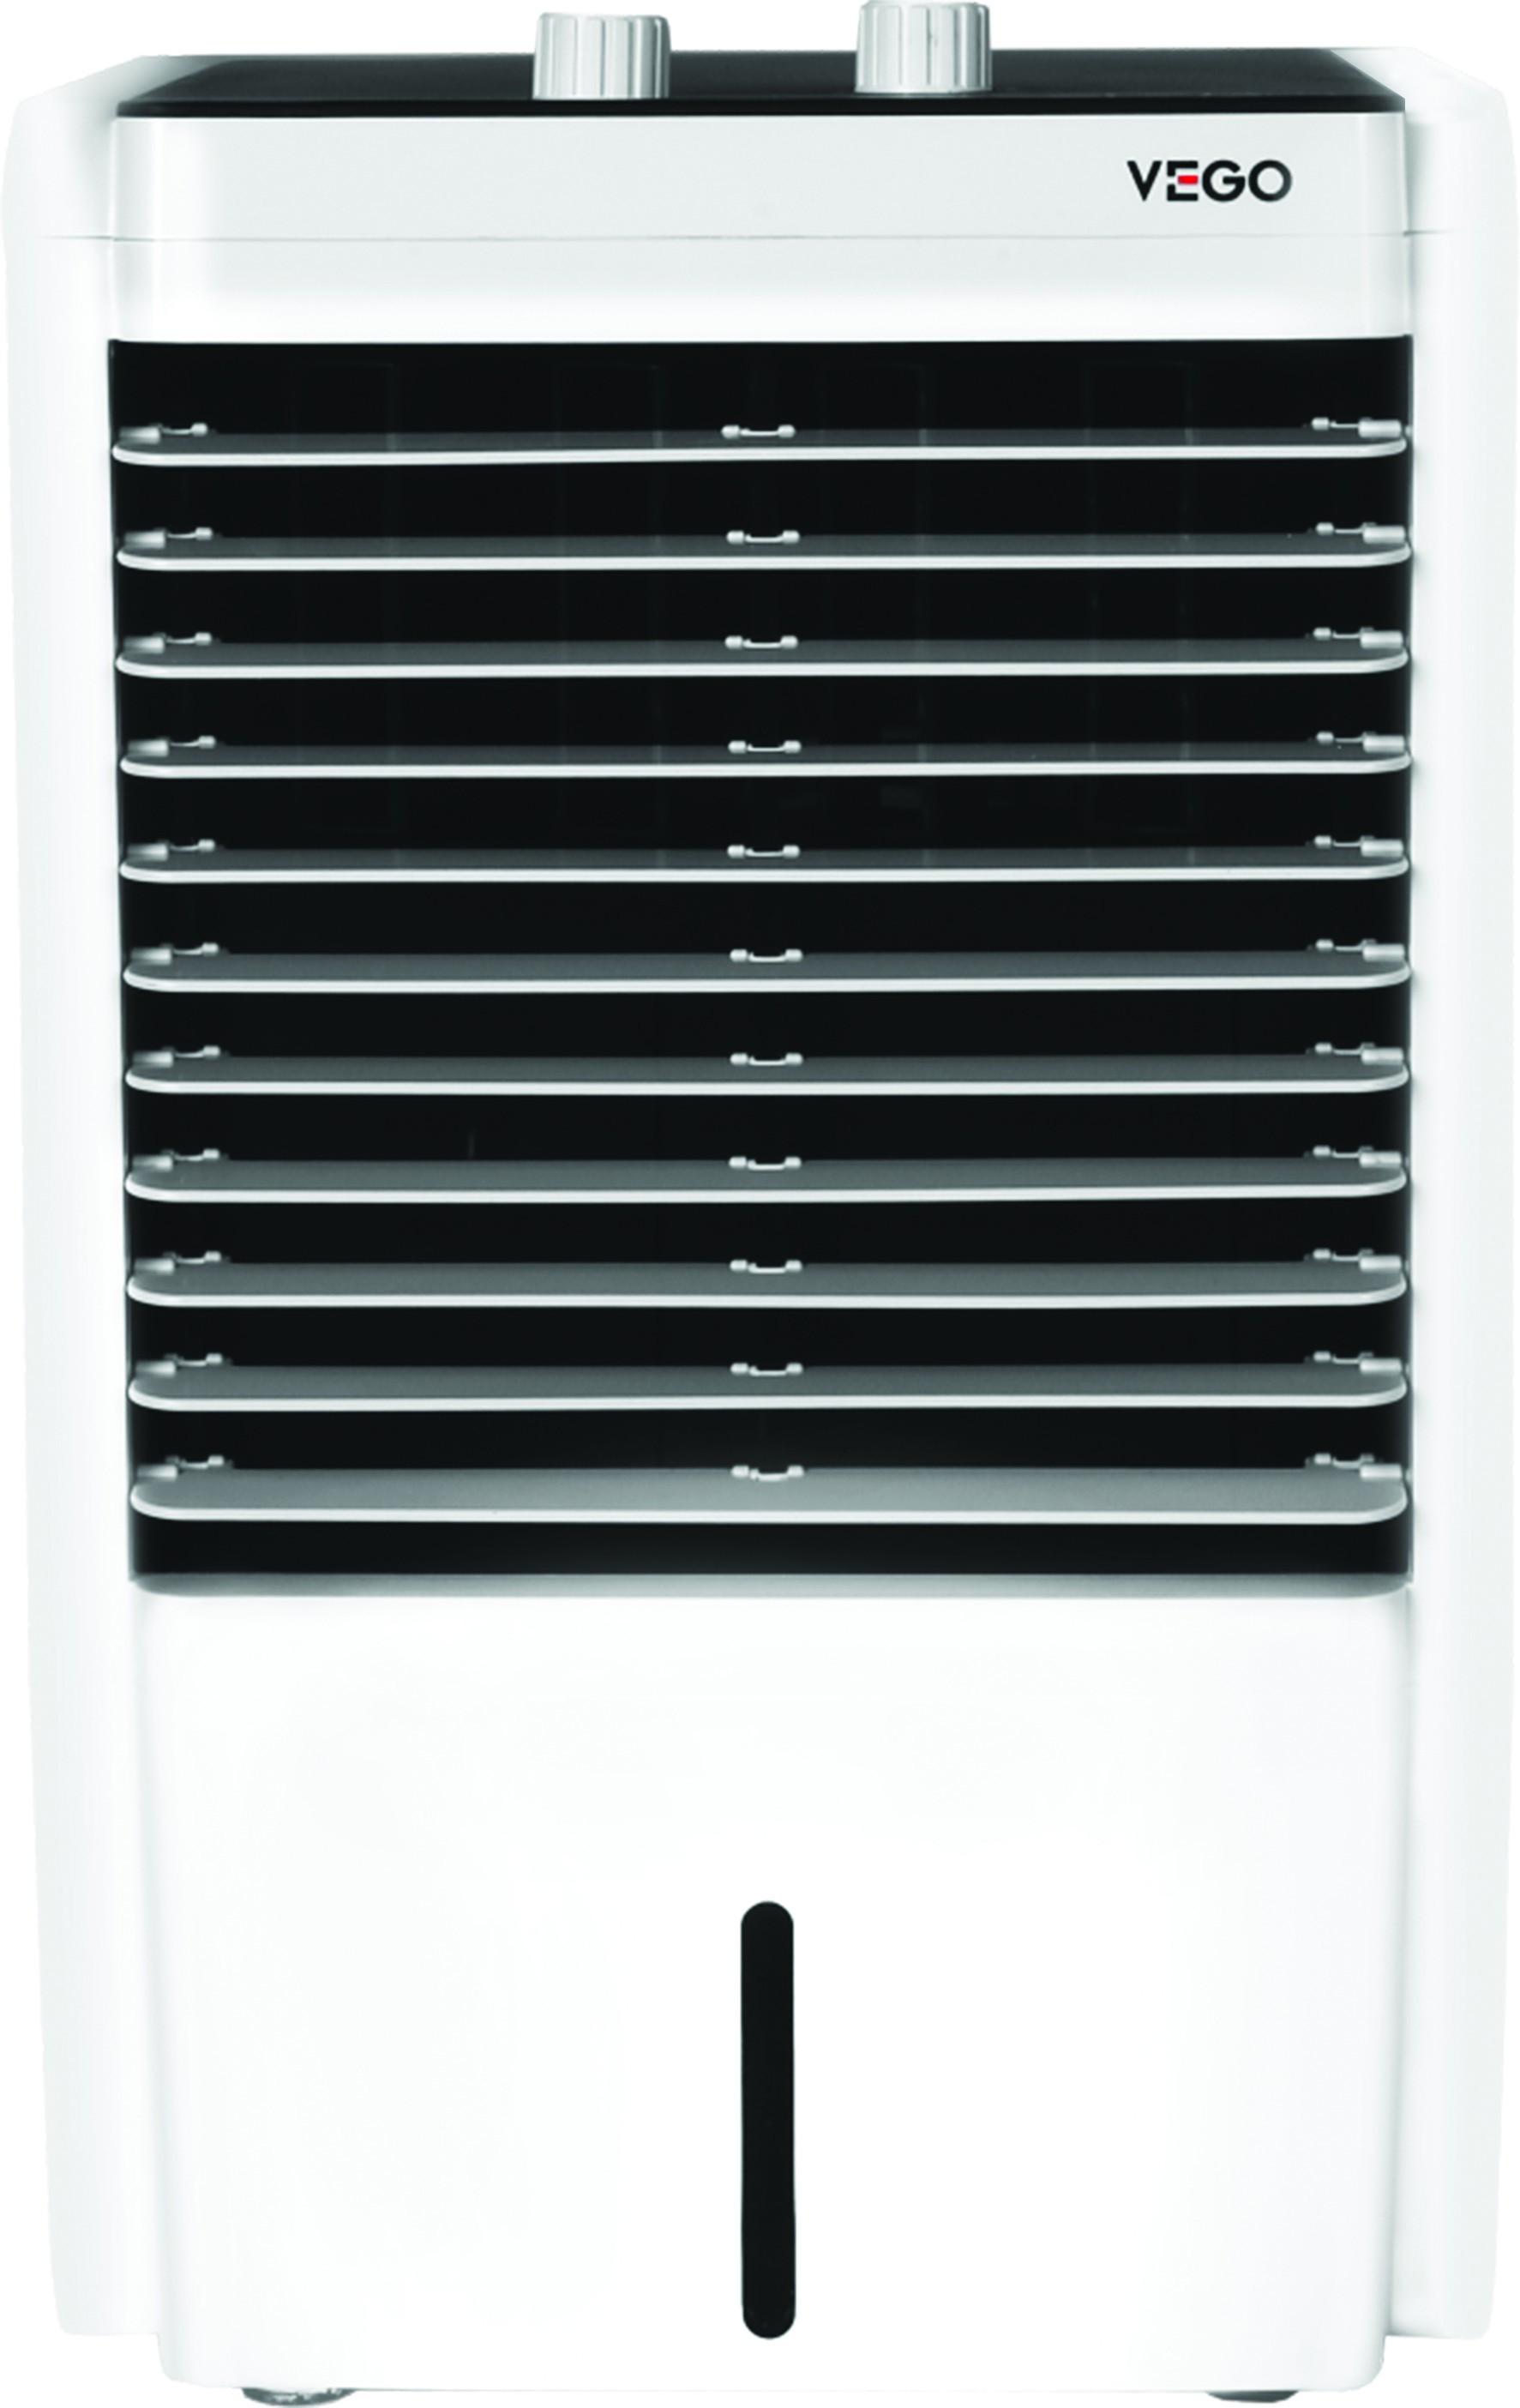 Vego Atom+ Personal Air Cooler Image